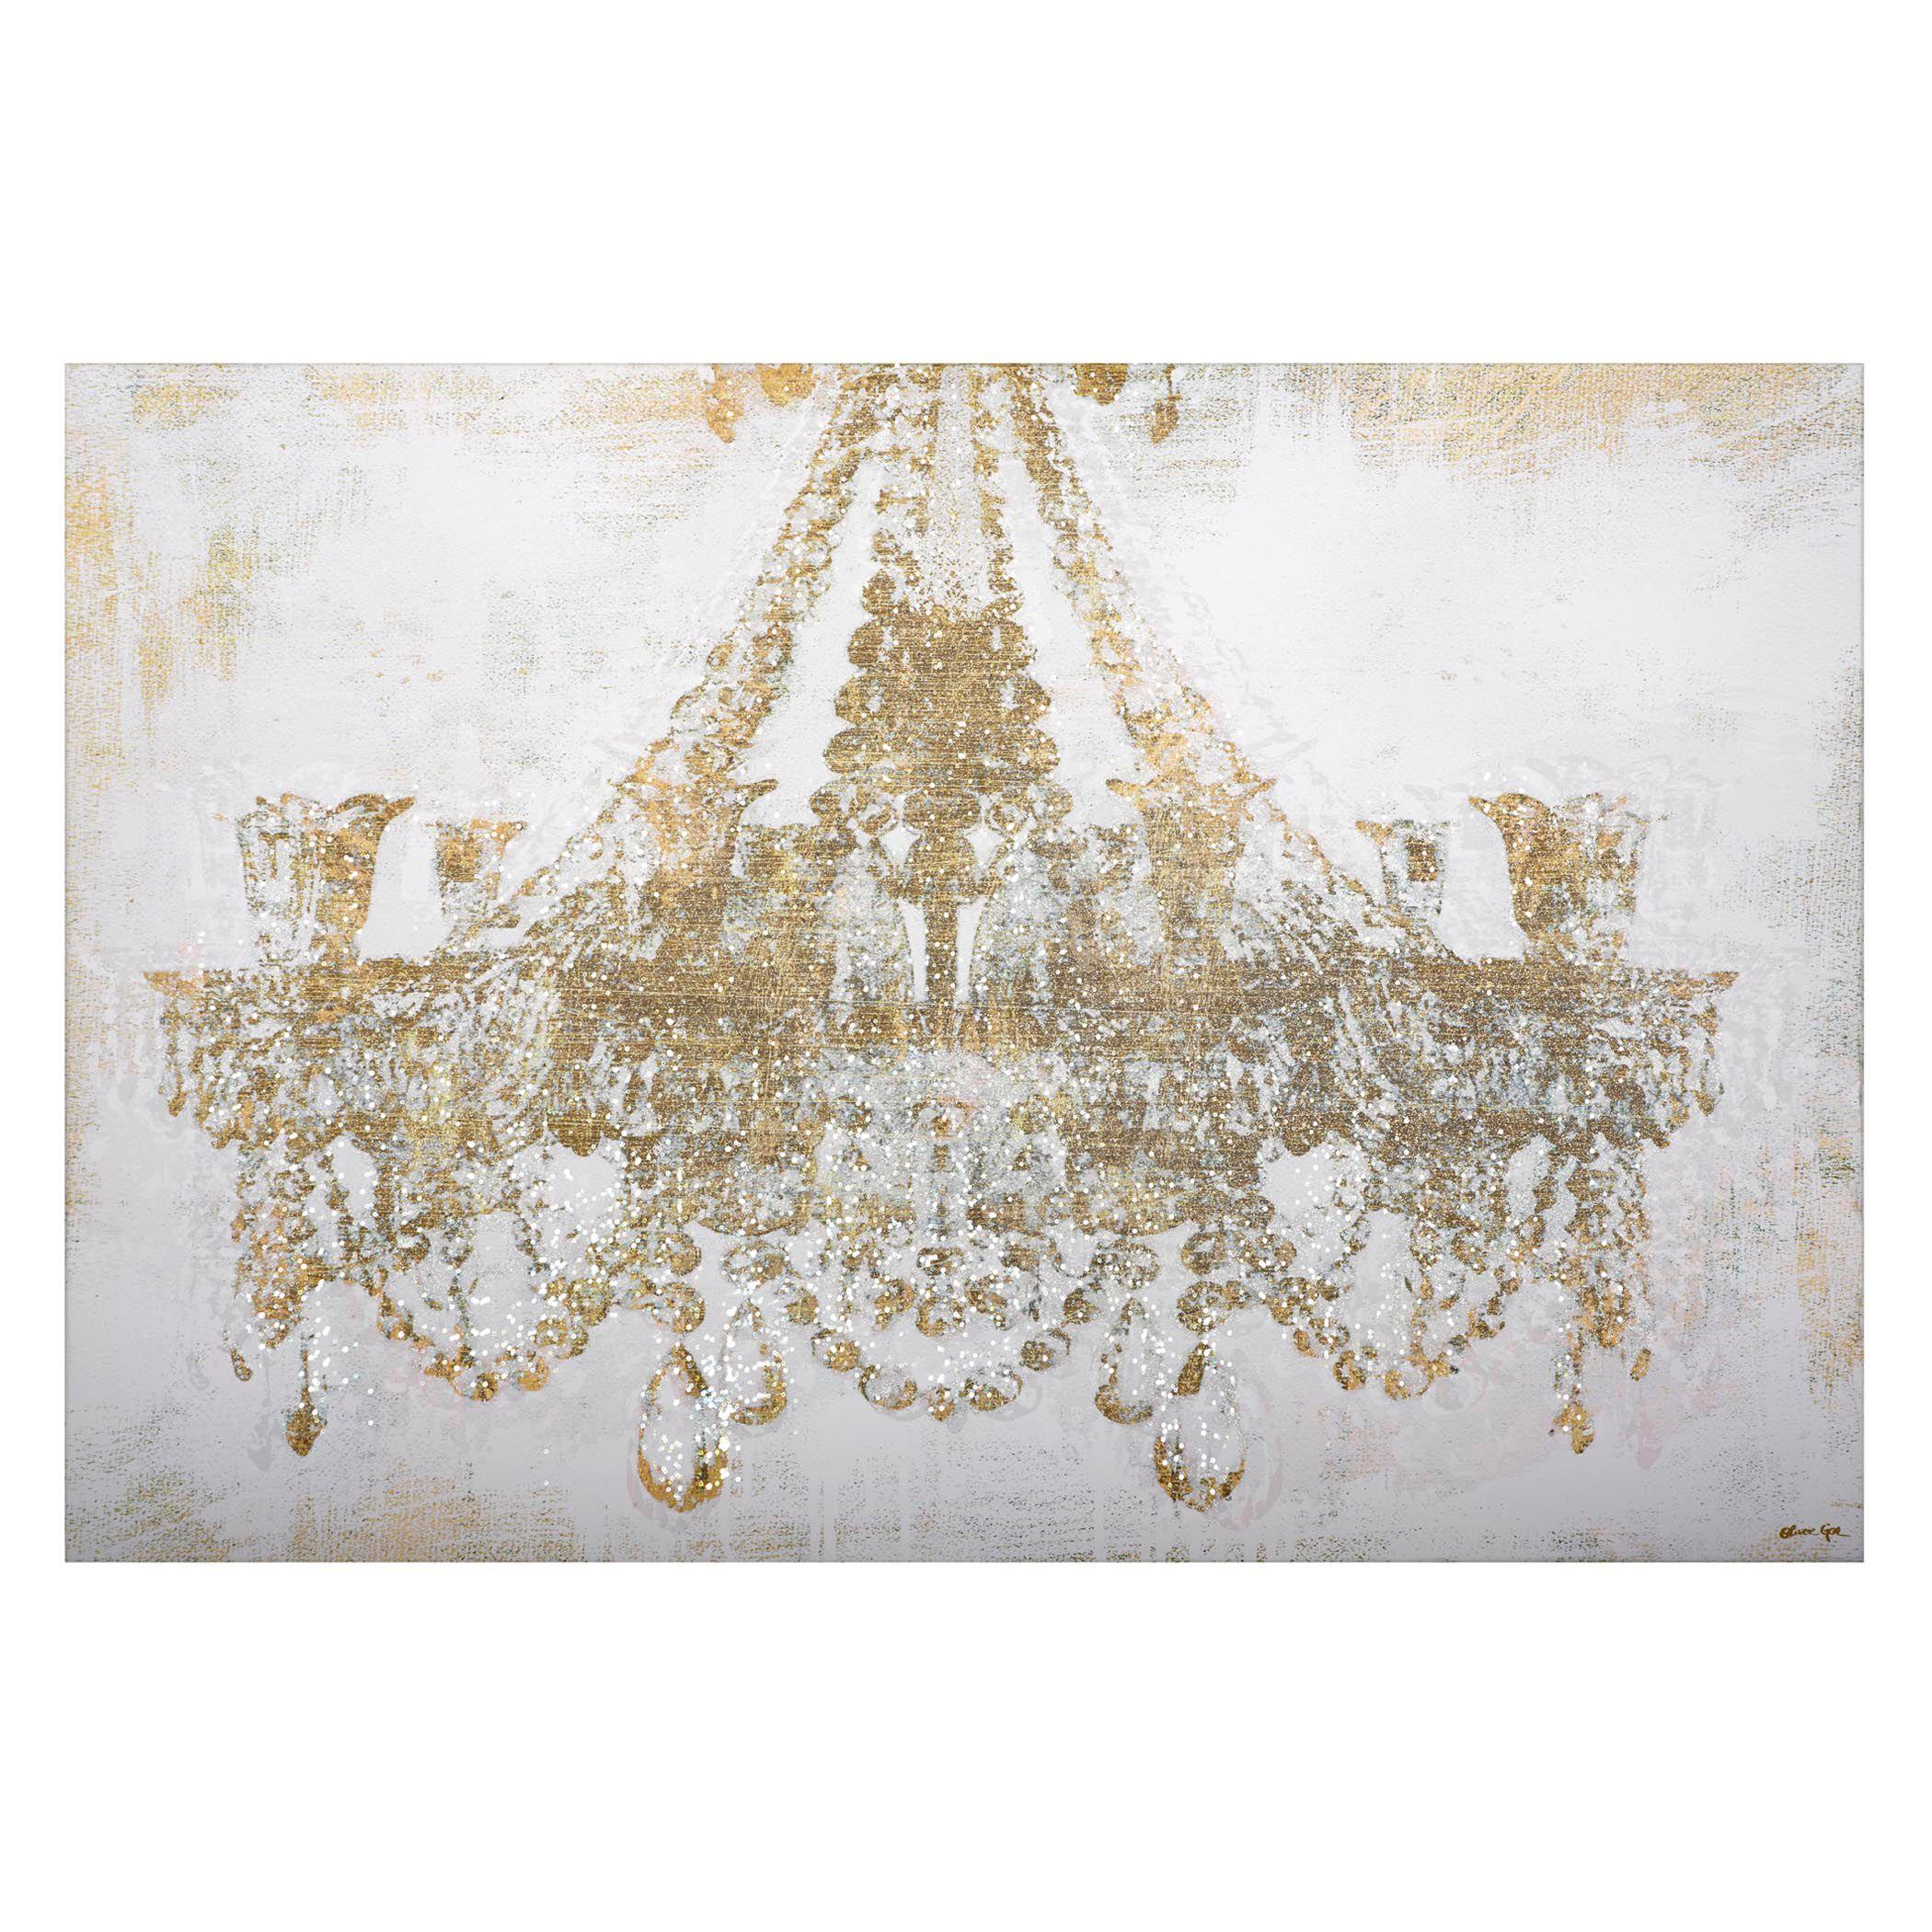 Chandelier Diamond Dust All Art Art Z Gallerie Oliver Gal Bildideen Leinwand